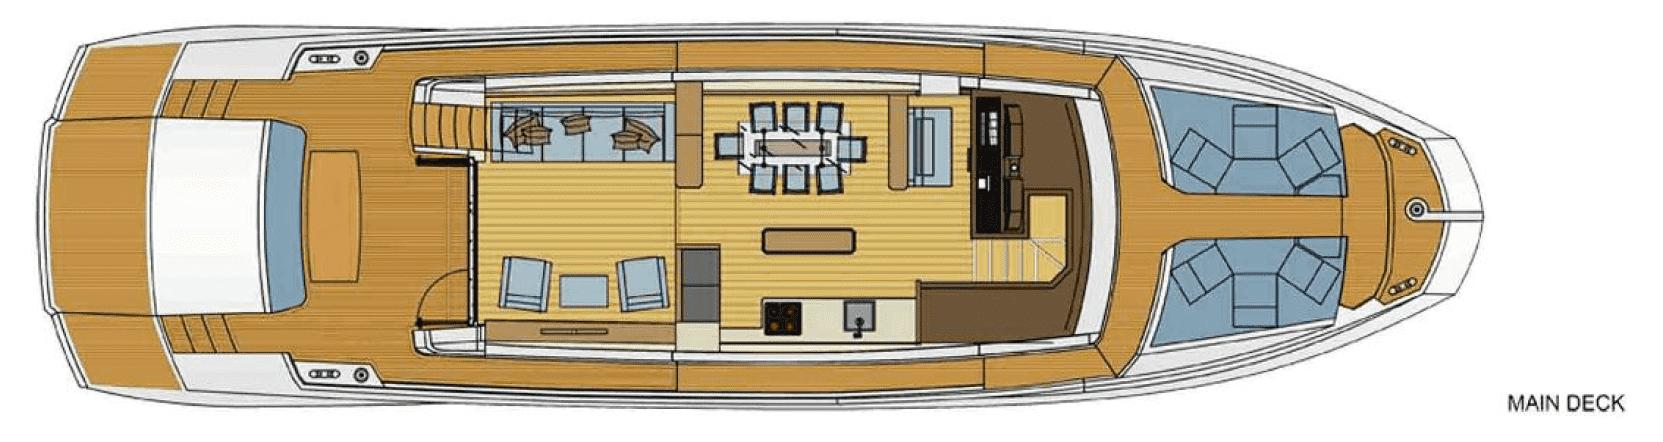 Plan of the deck 2 of Astondoa 72 / Plano de la cubierta 2 del Astondoa 72